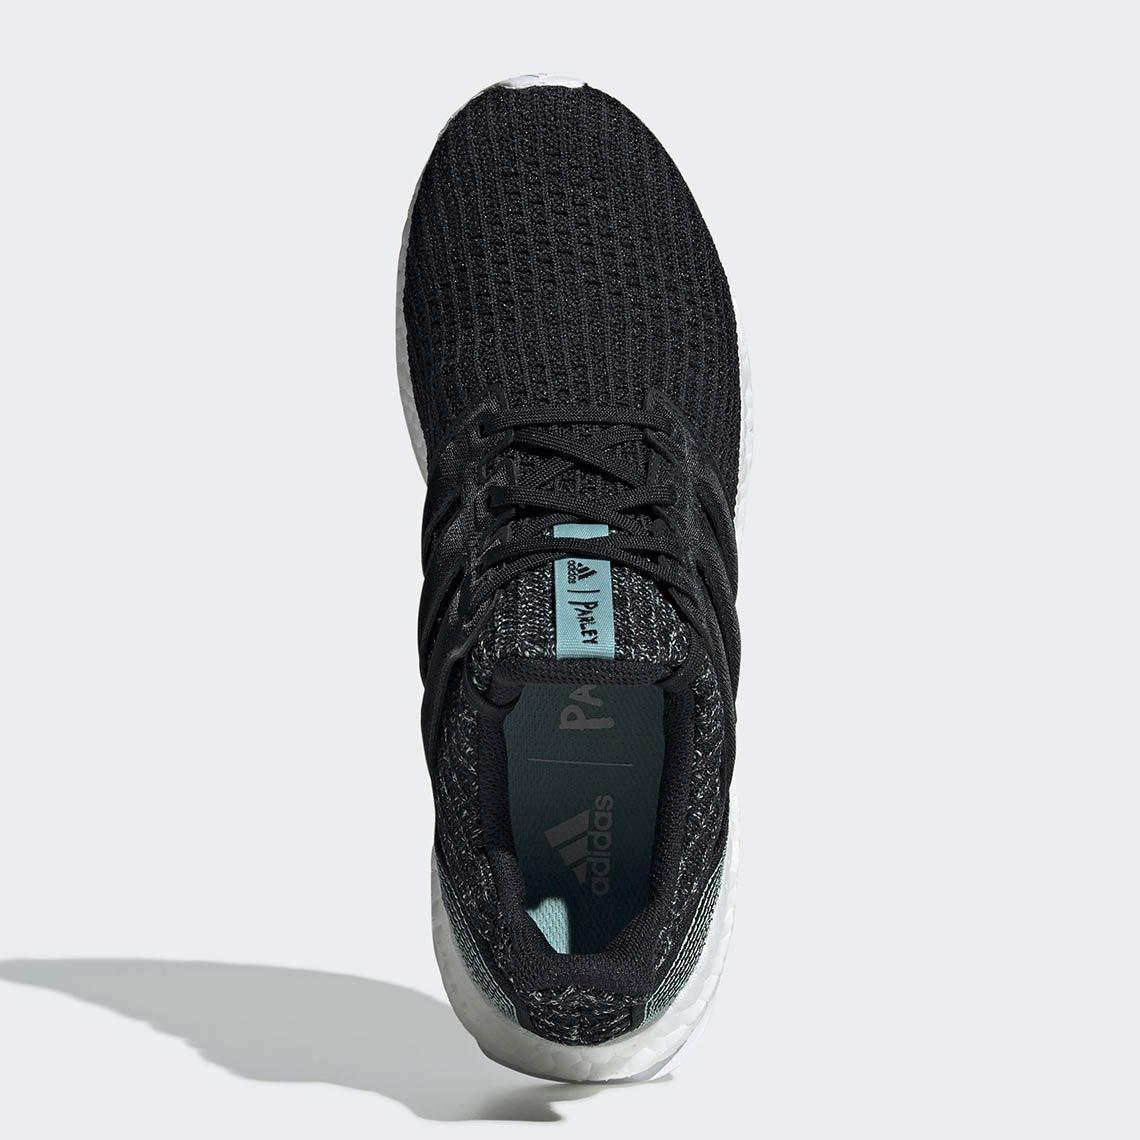 3f49c41e7d6c5 Parley adidas Ultra Boost Black F35190 Release Info